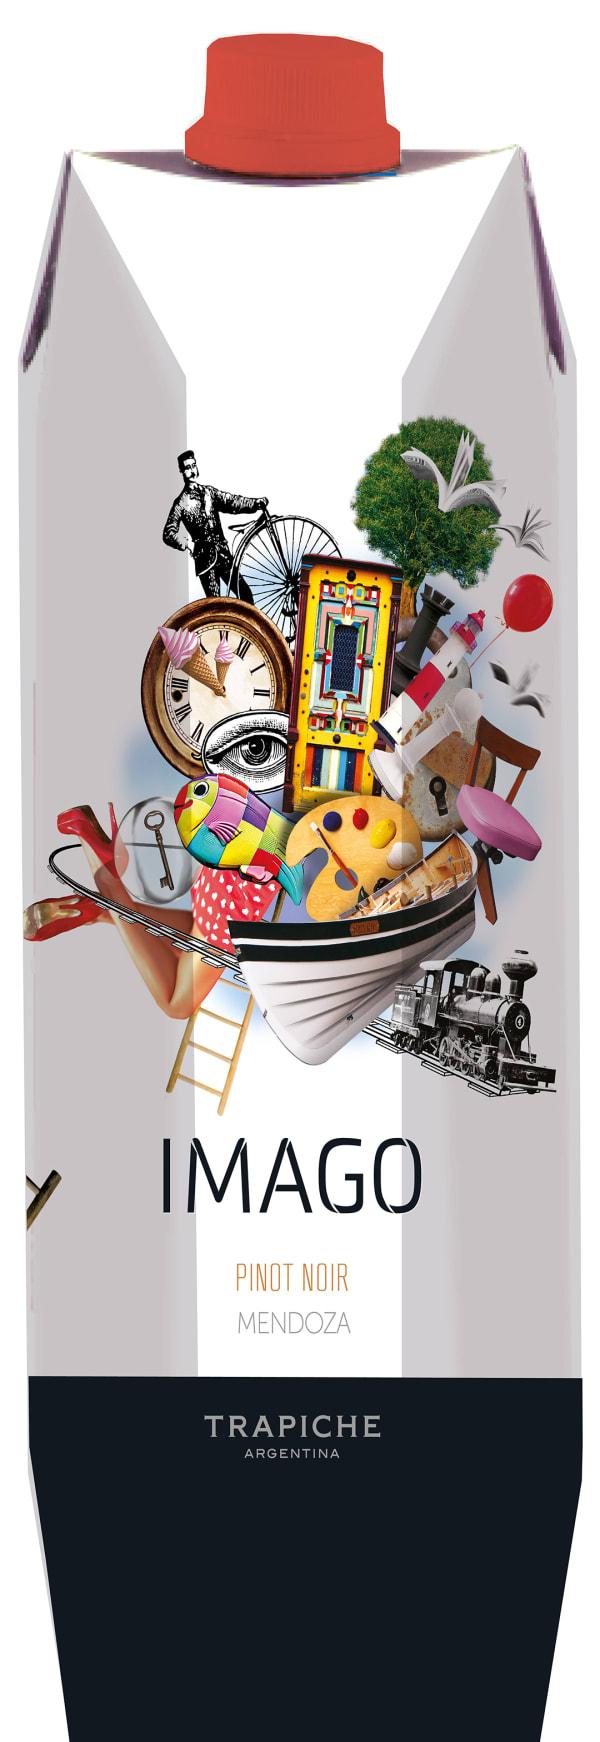 Trapiche Imago Pinot Noir 2015 carton package